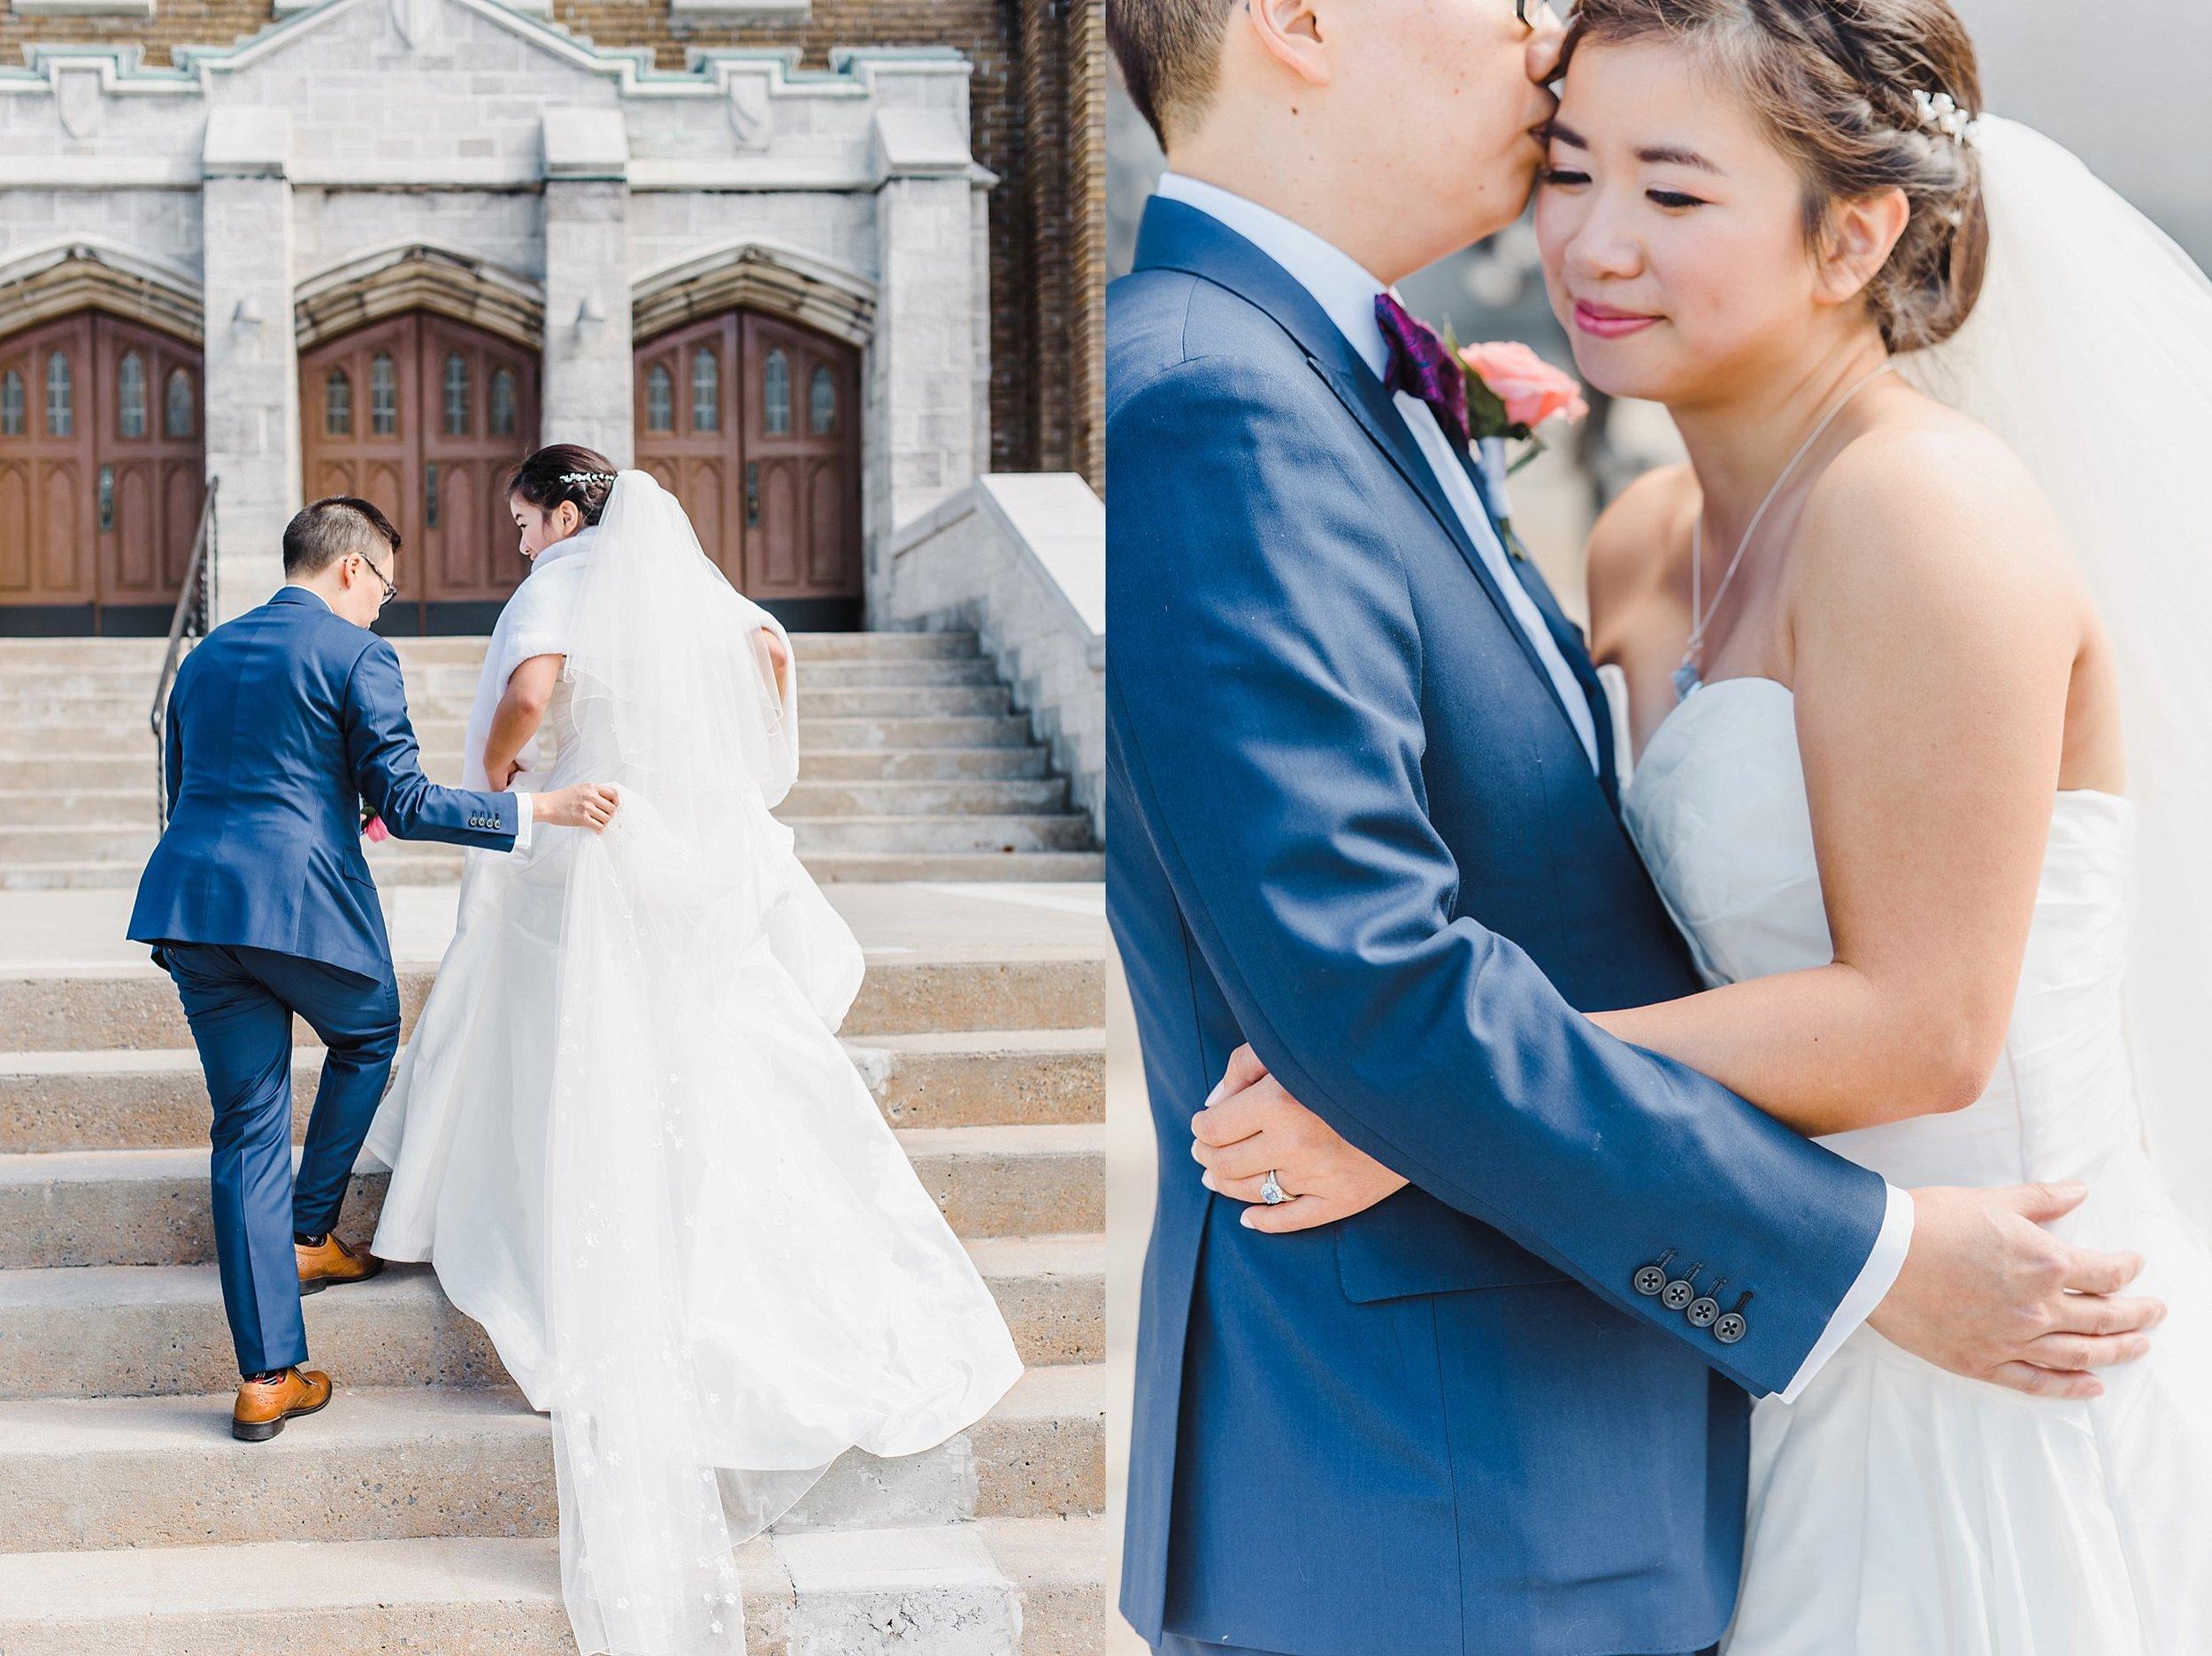 light airy indie fine art ottawa wedding photographer | Ali and Batoul Photography_1494.jpg